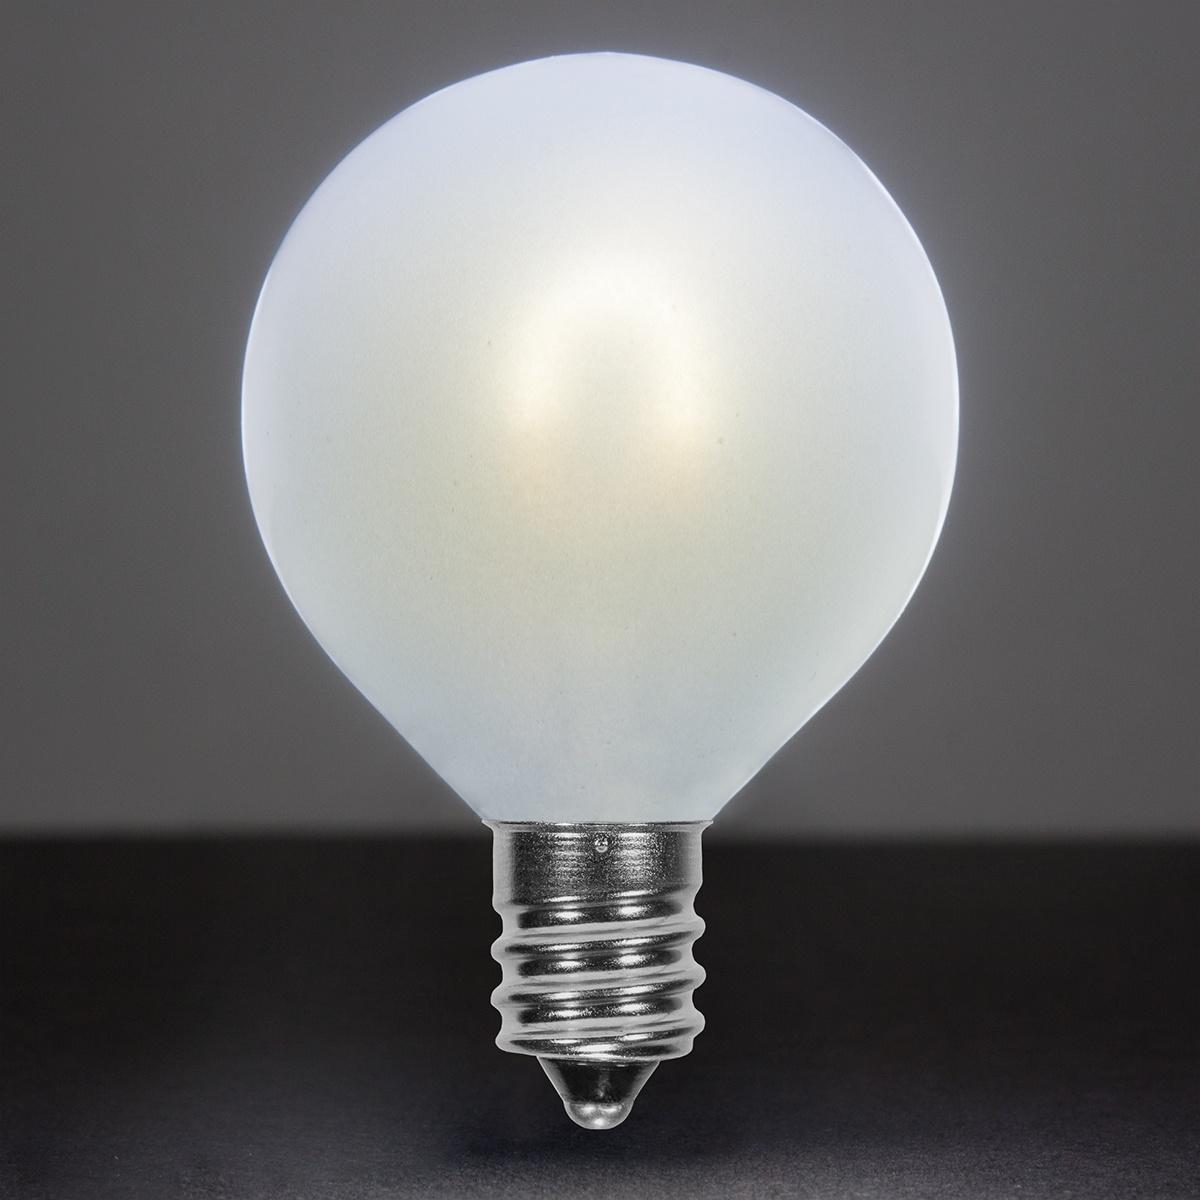 G50 Cool White Glass FlexFilament TM LED Edison Bulb Satin